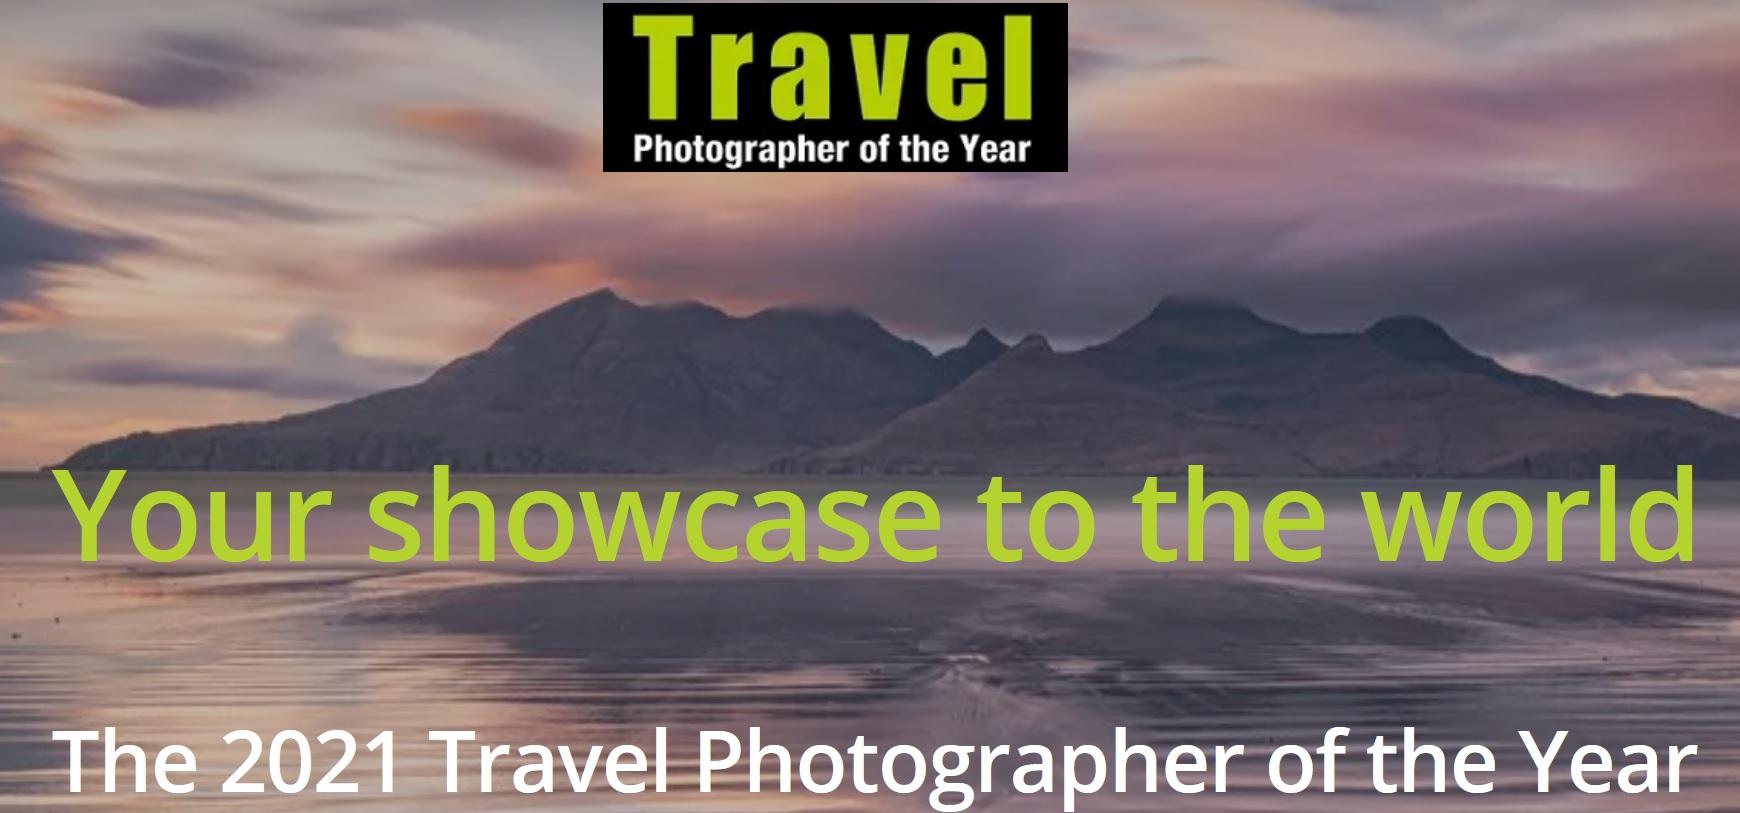 TPOTY 2021 Travel Photographer of the Year - logo